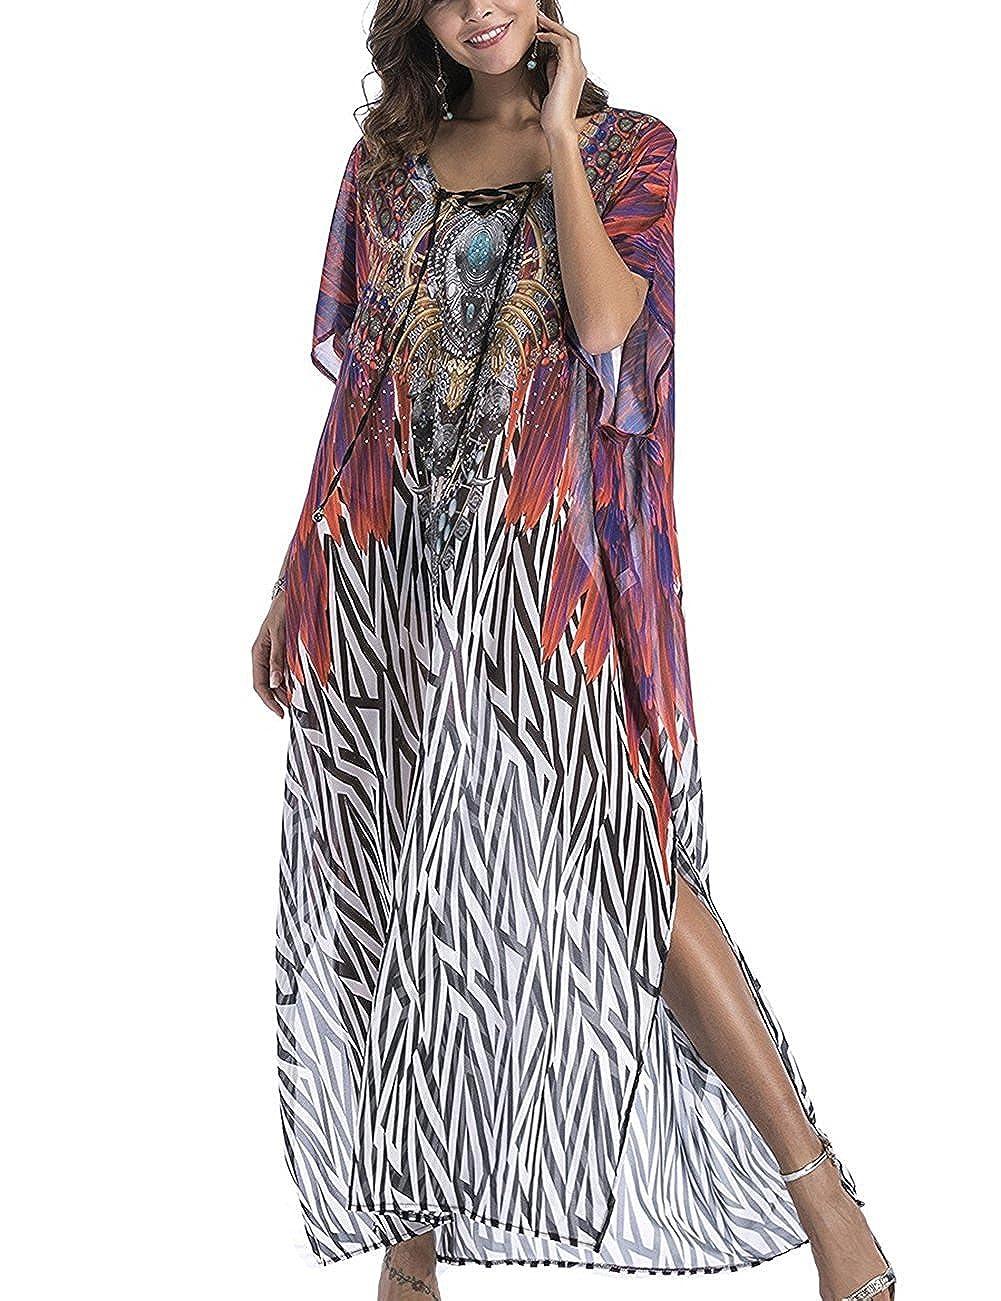 b981224fe14b8 batwing sleeve,Rhinestone ,V Neck ,Long Caftan,Print Chiffon,Turkish Dress,Beach  Kaftan Kaftan Cover Up Dresses,Oversized Beach Dress,V Neck Beach Dress ...